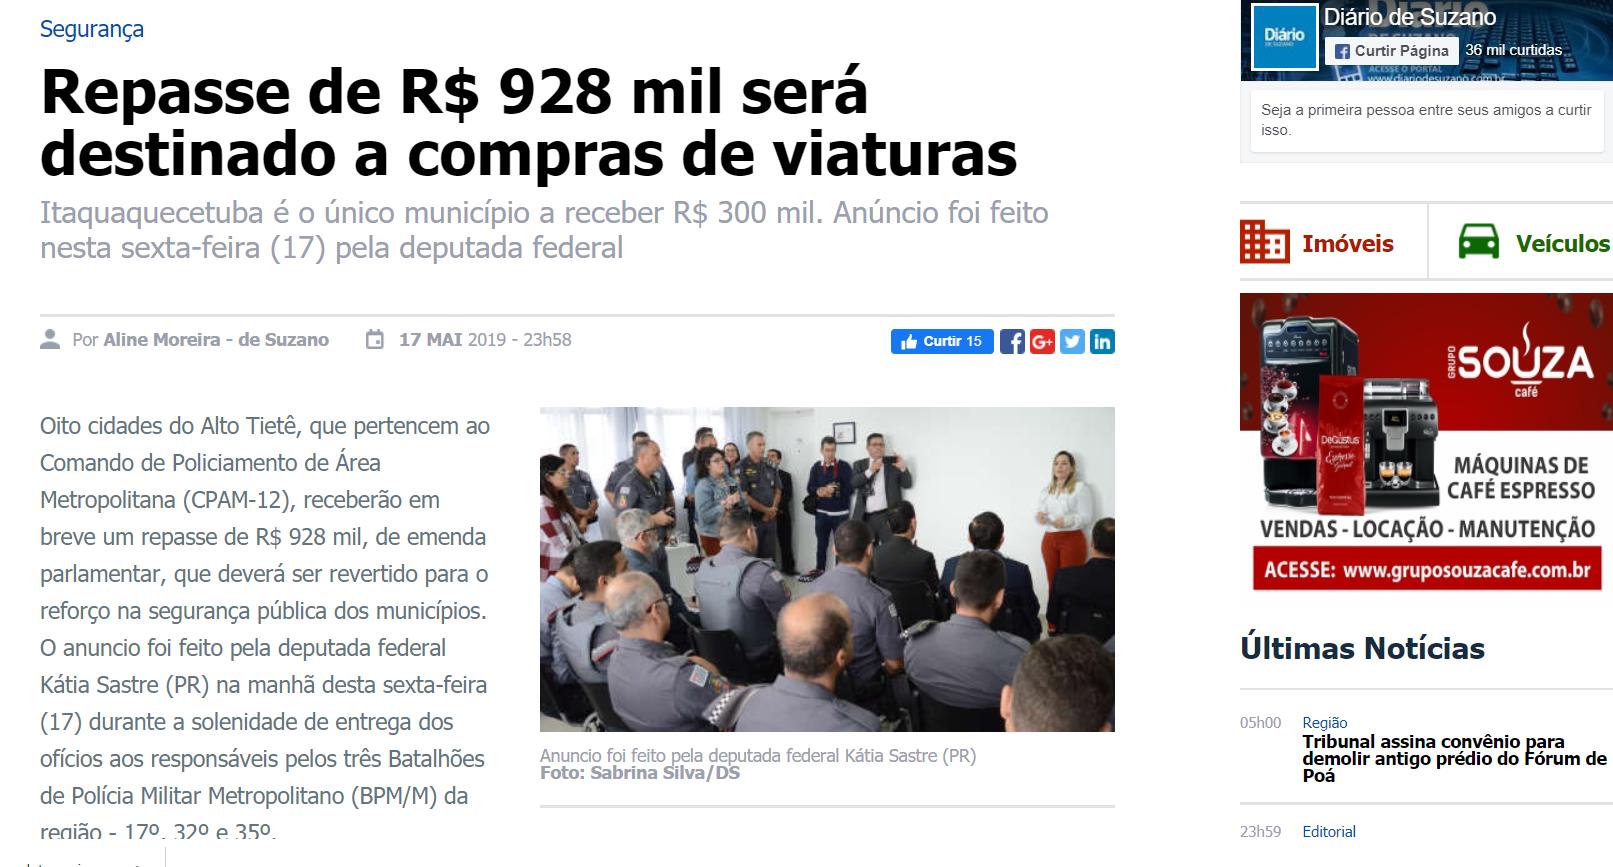 Repasse de R$ 928 mil será destinado a compras de viaturas